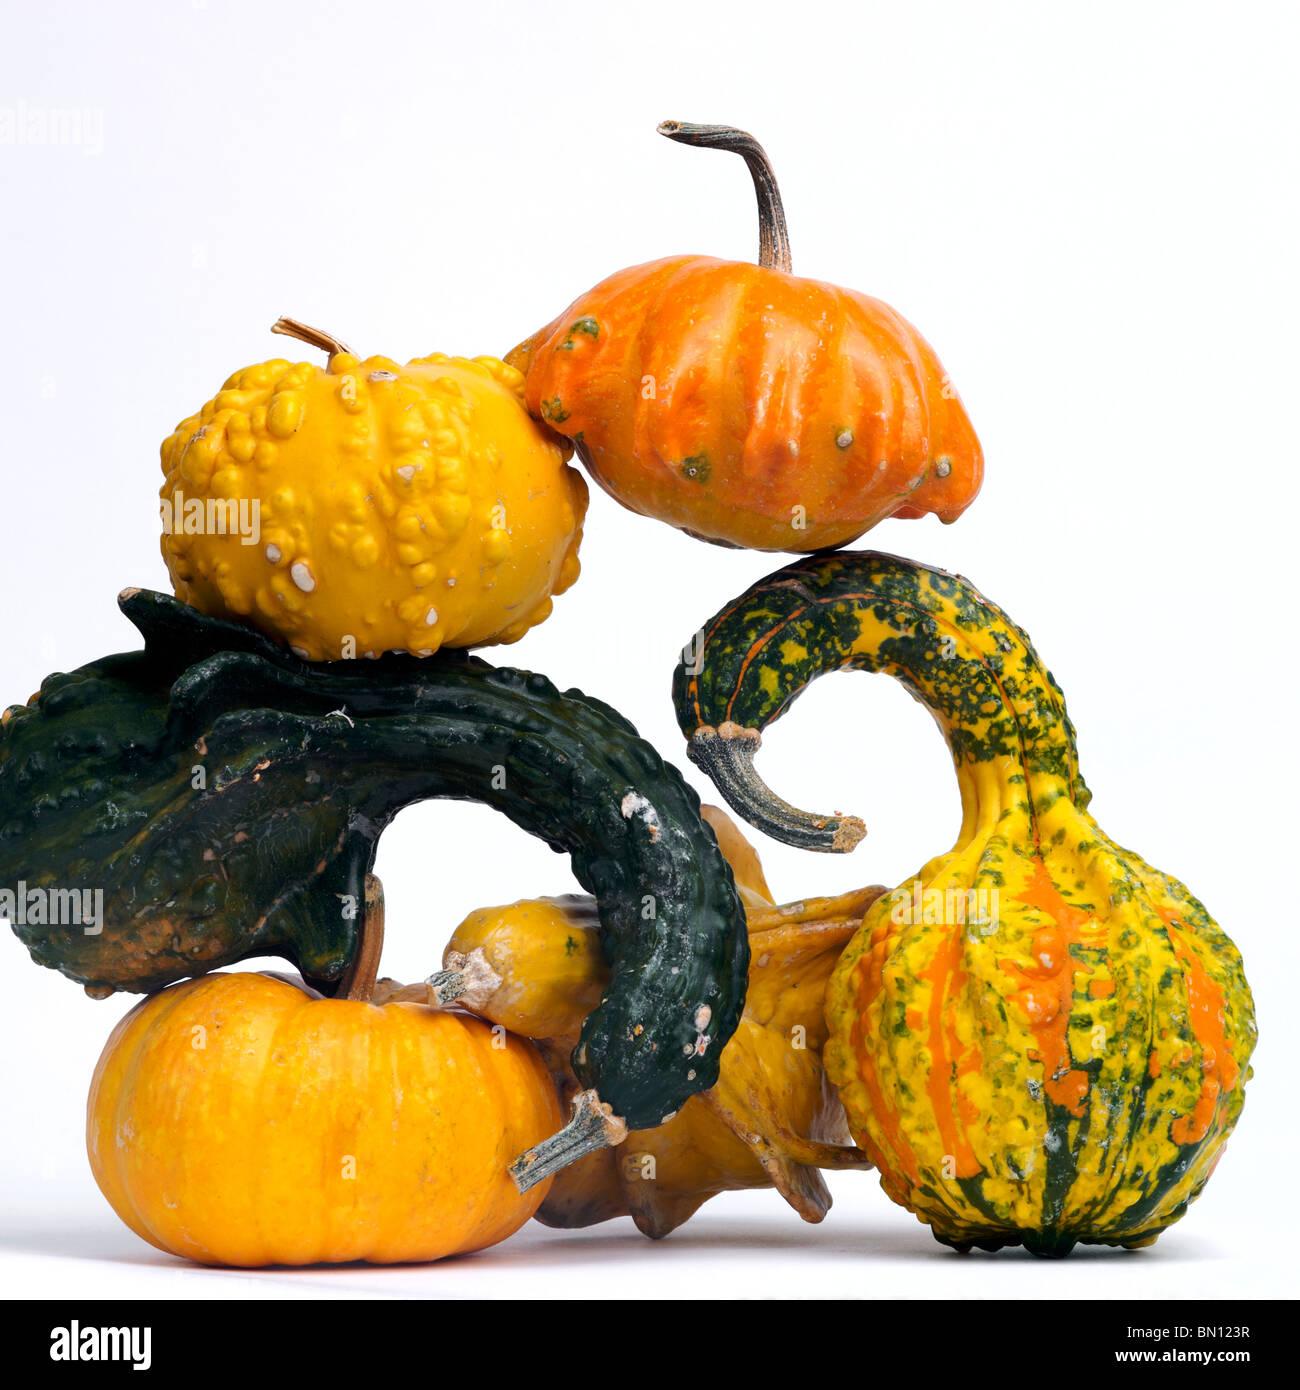 Pile of gourds / squash in studio. - Stock Image